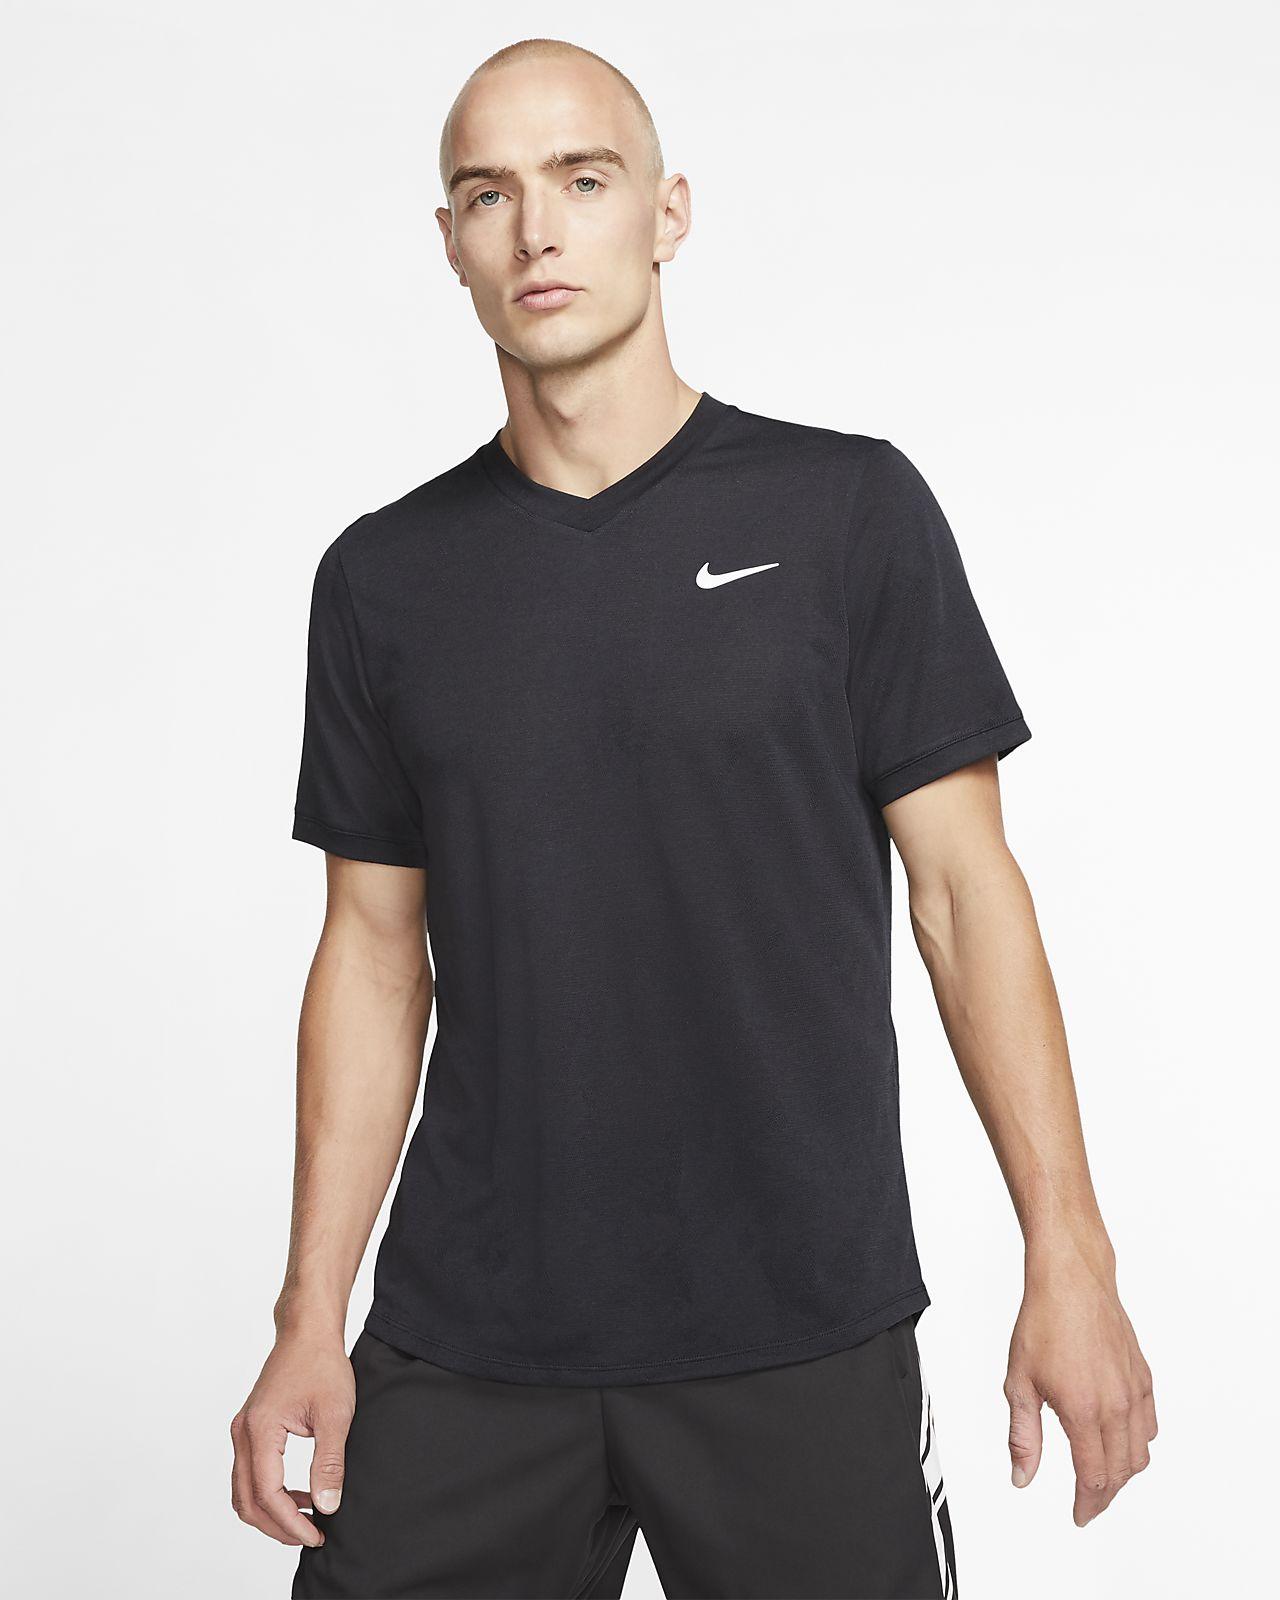 NikeCourt Dri-FIT Challenger Men's Short-Sleeve Tennis Top